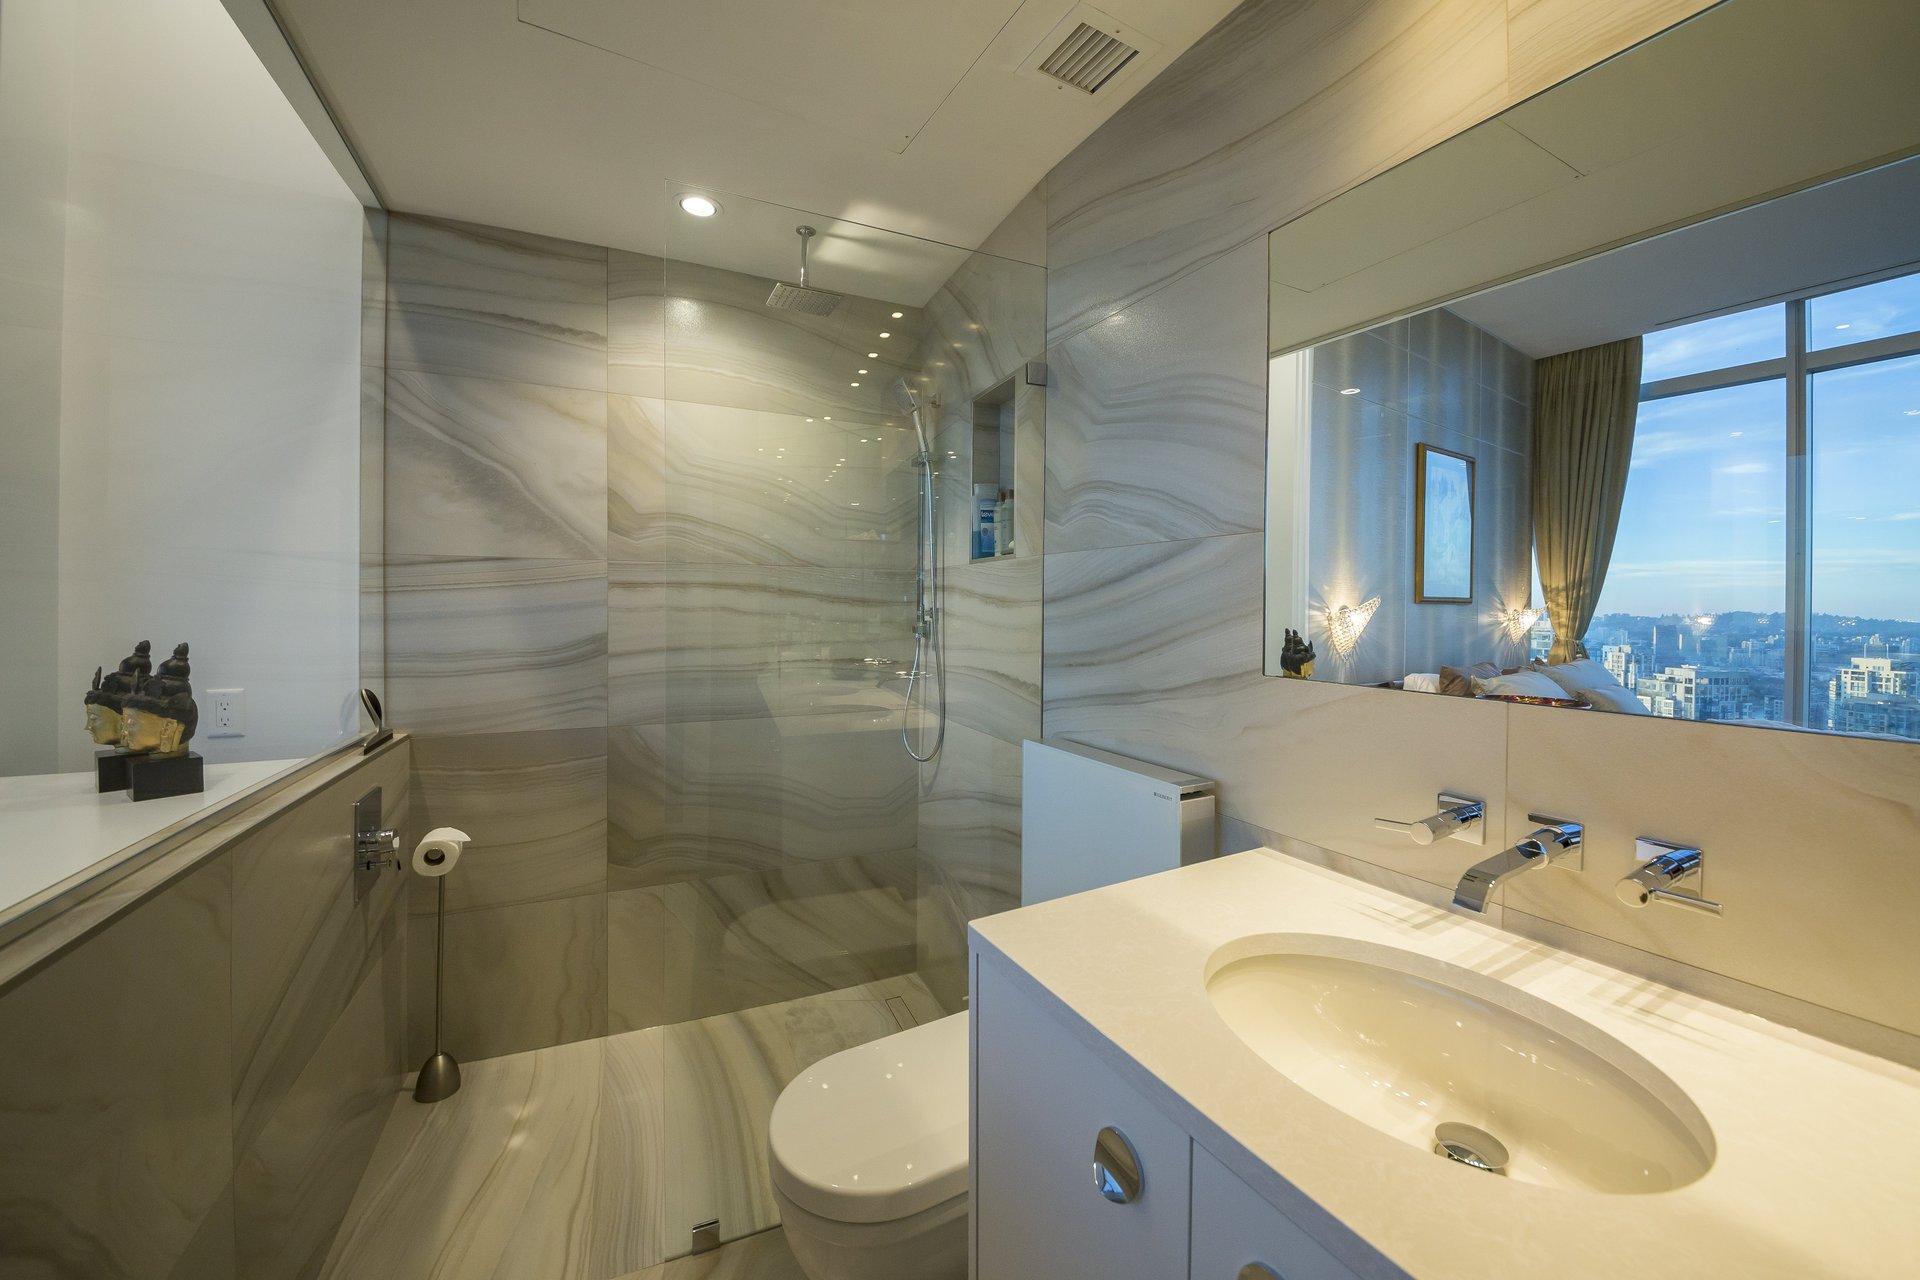 Sheraton Downtown Condo Bathroom Renovation Renovations Contracting Work Interior Design